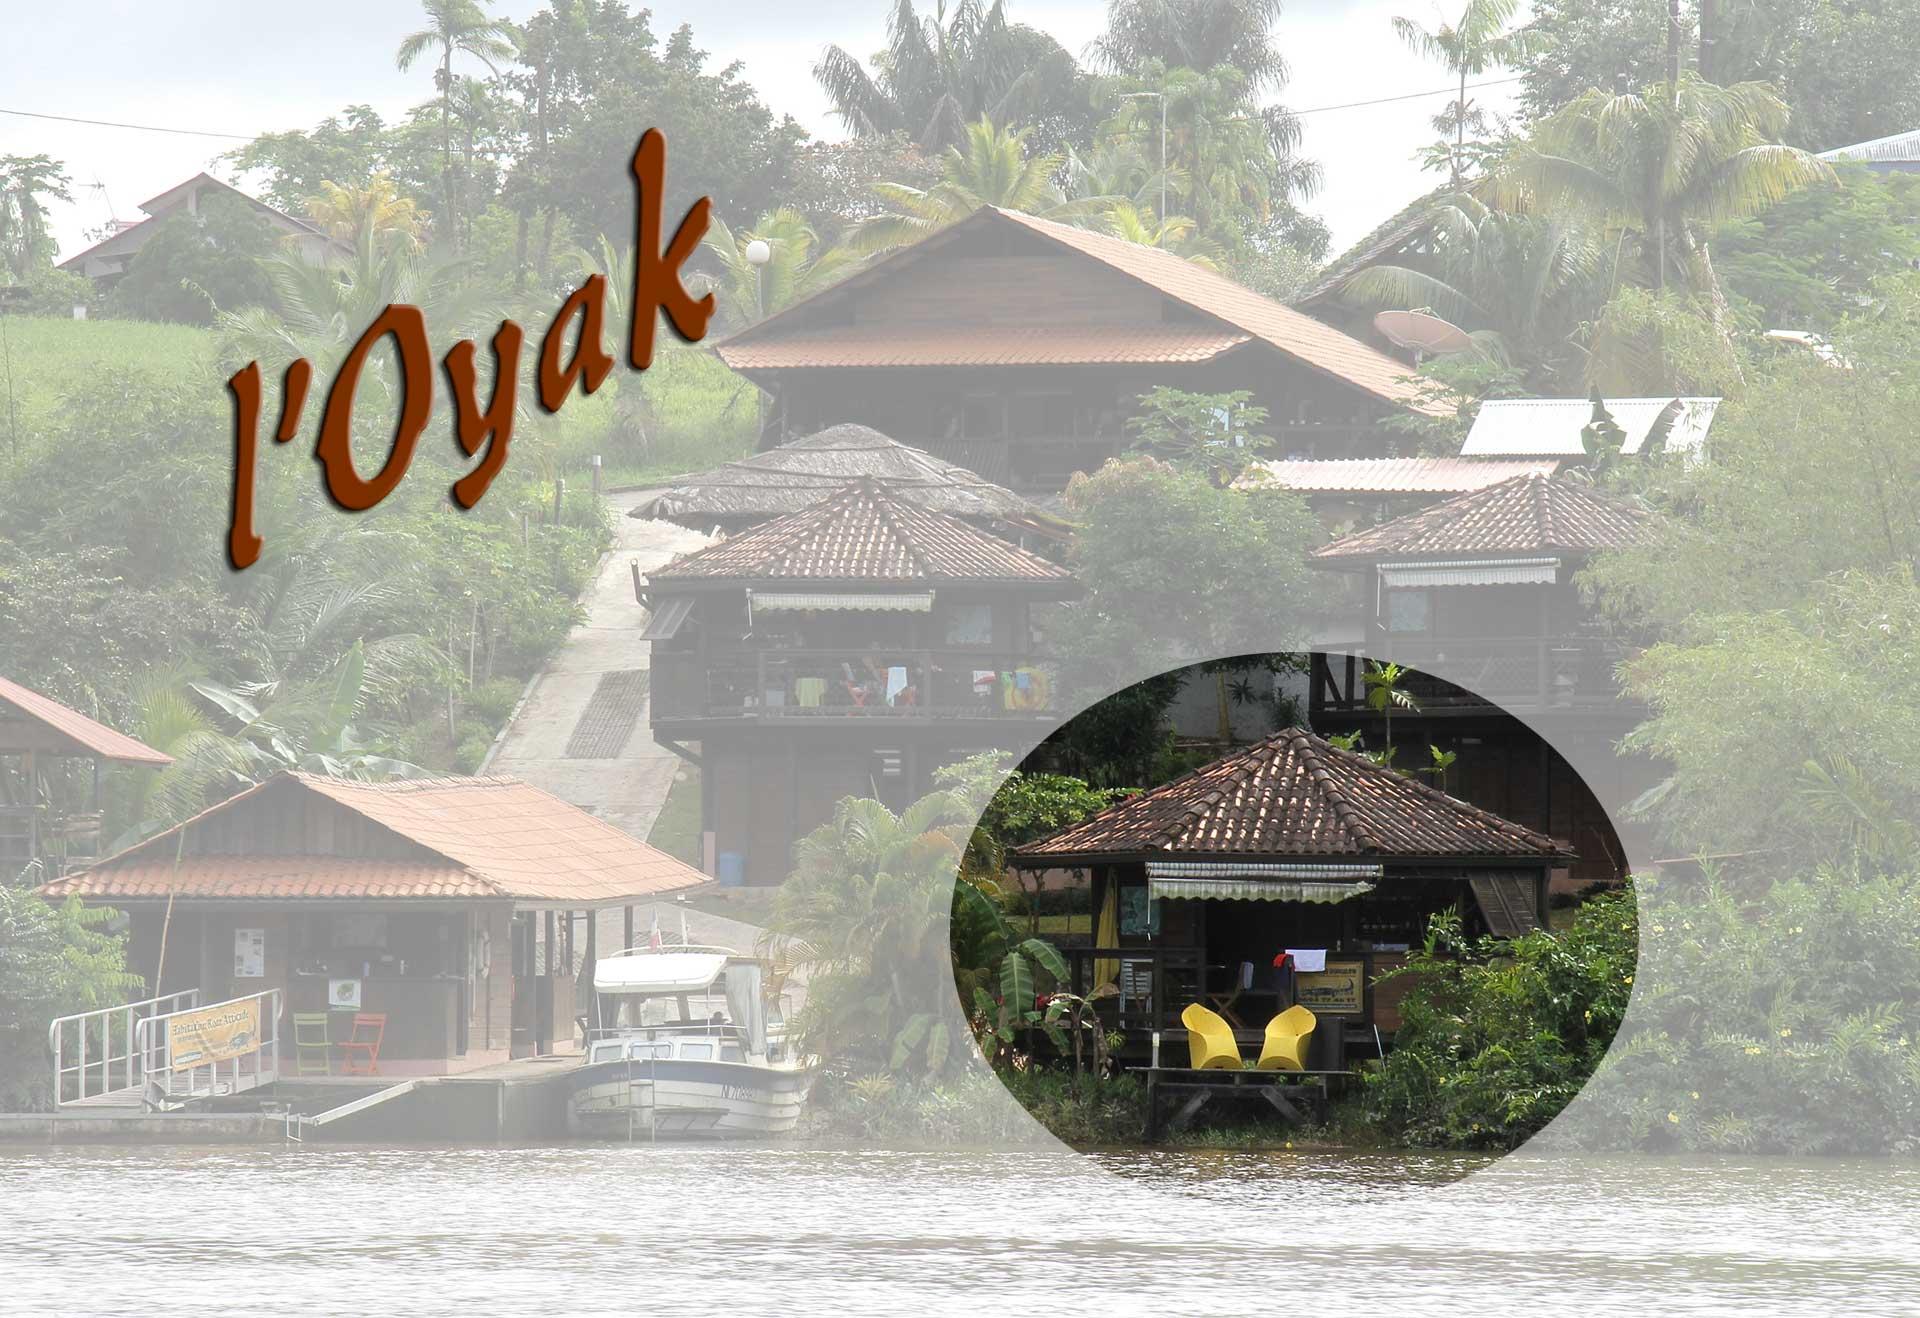 http://www.location-guyane.fr/wp-content/uploads/2015/04/RA-oyak.jpg